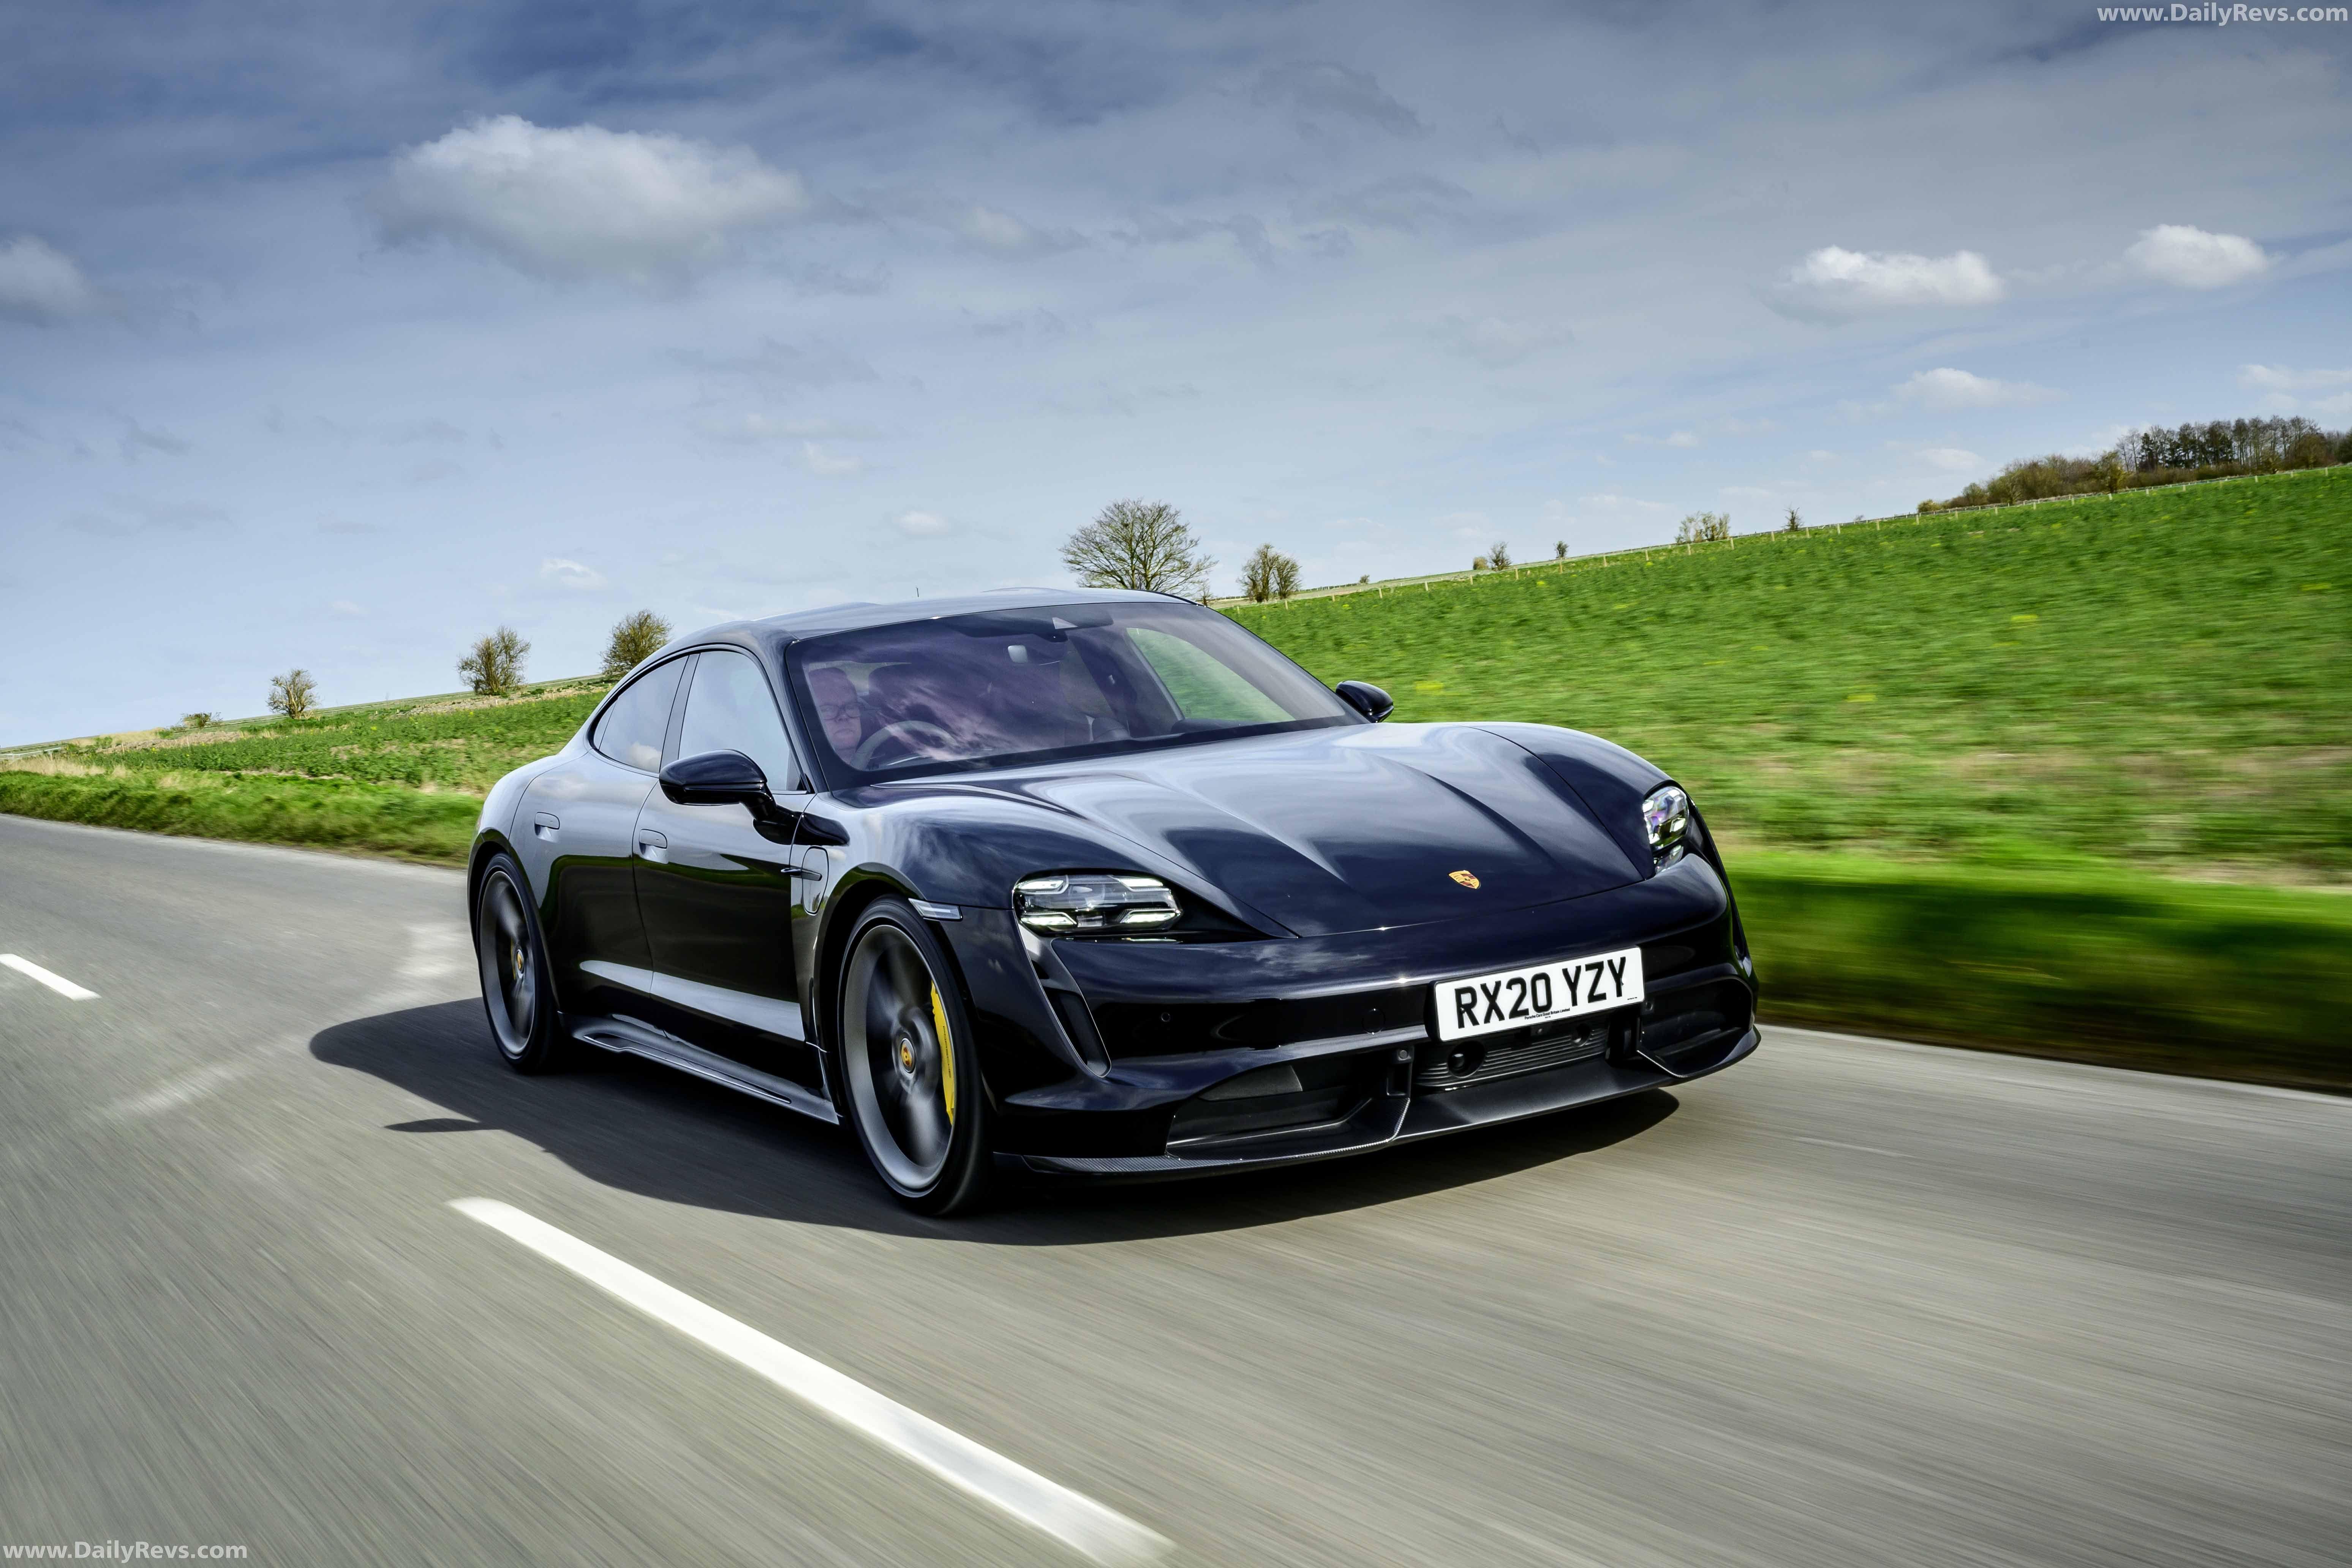 2020 Porsche Taycan Turbo S [UK] in 2020